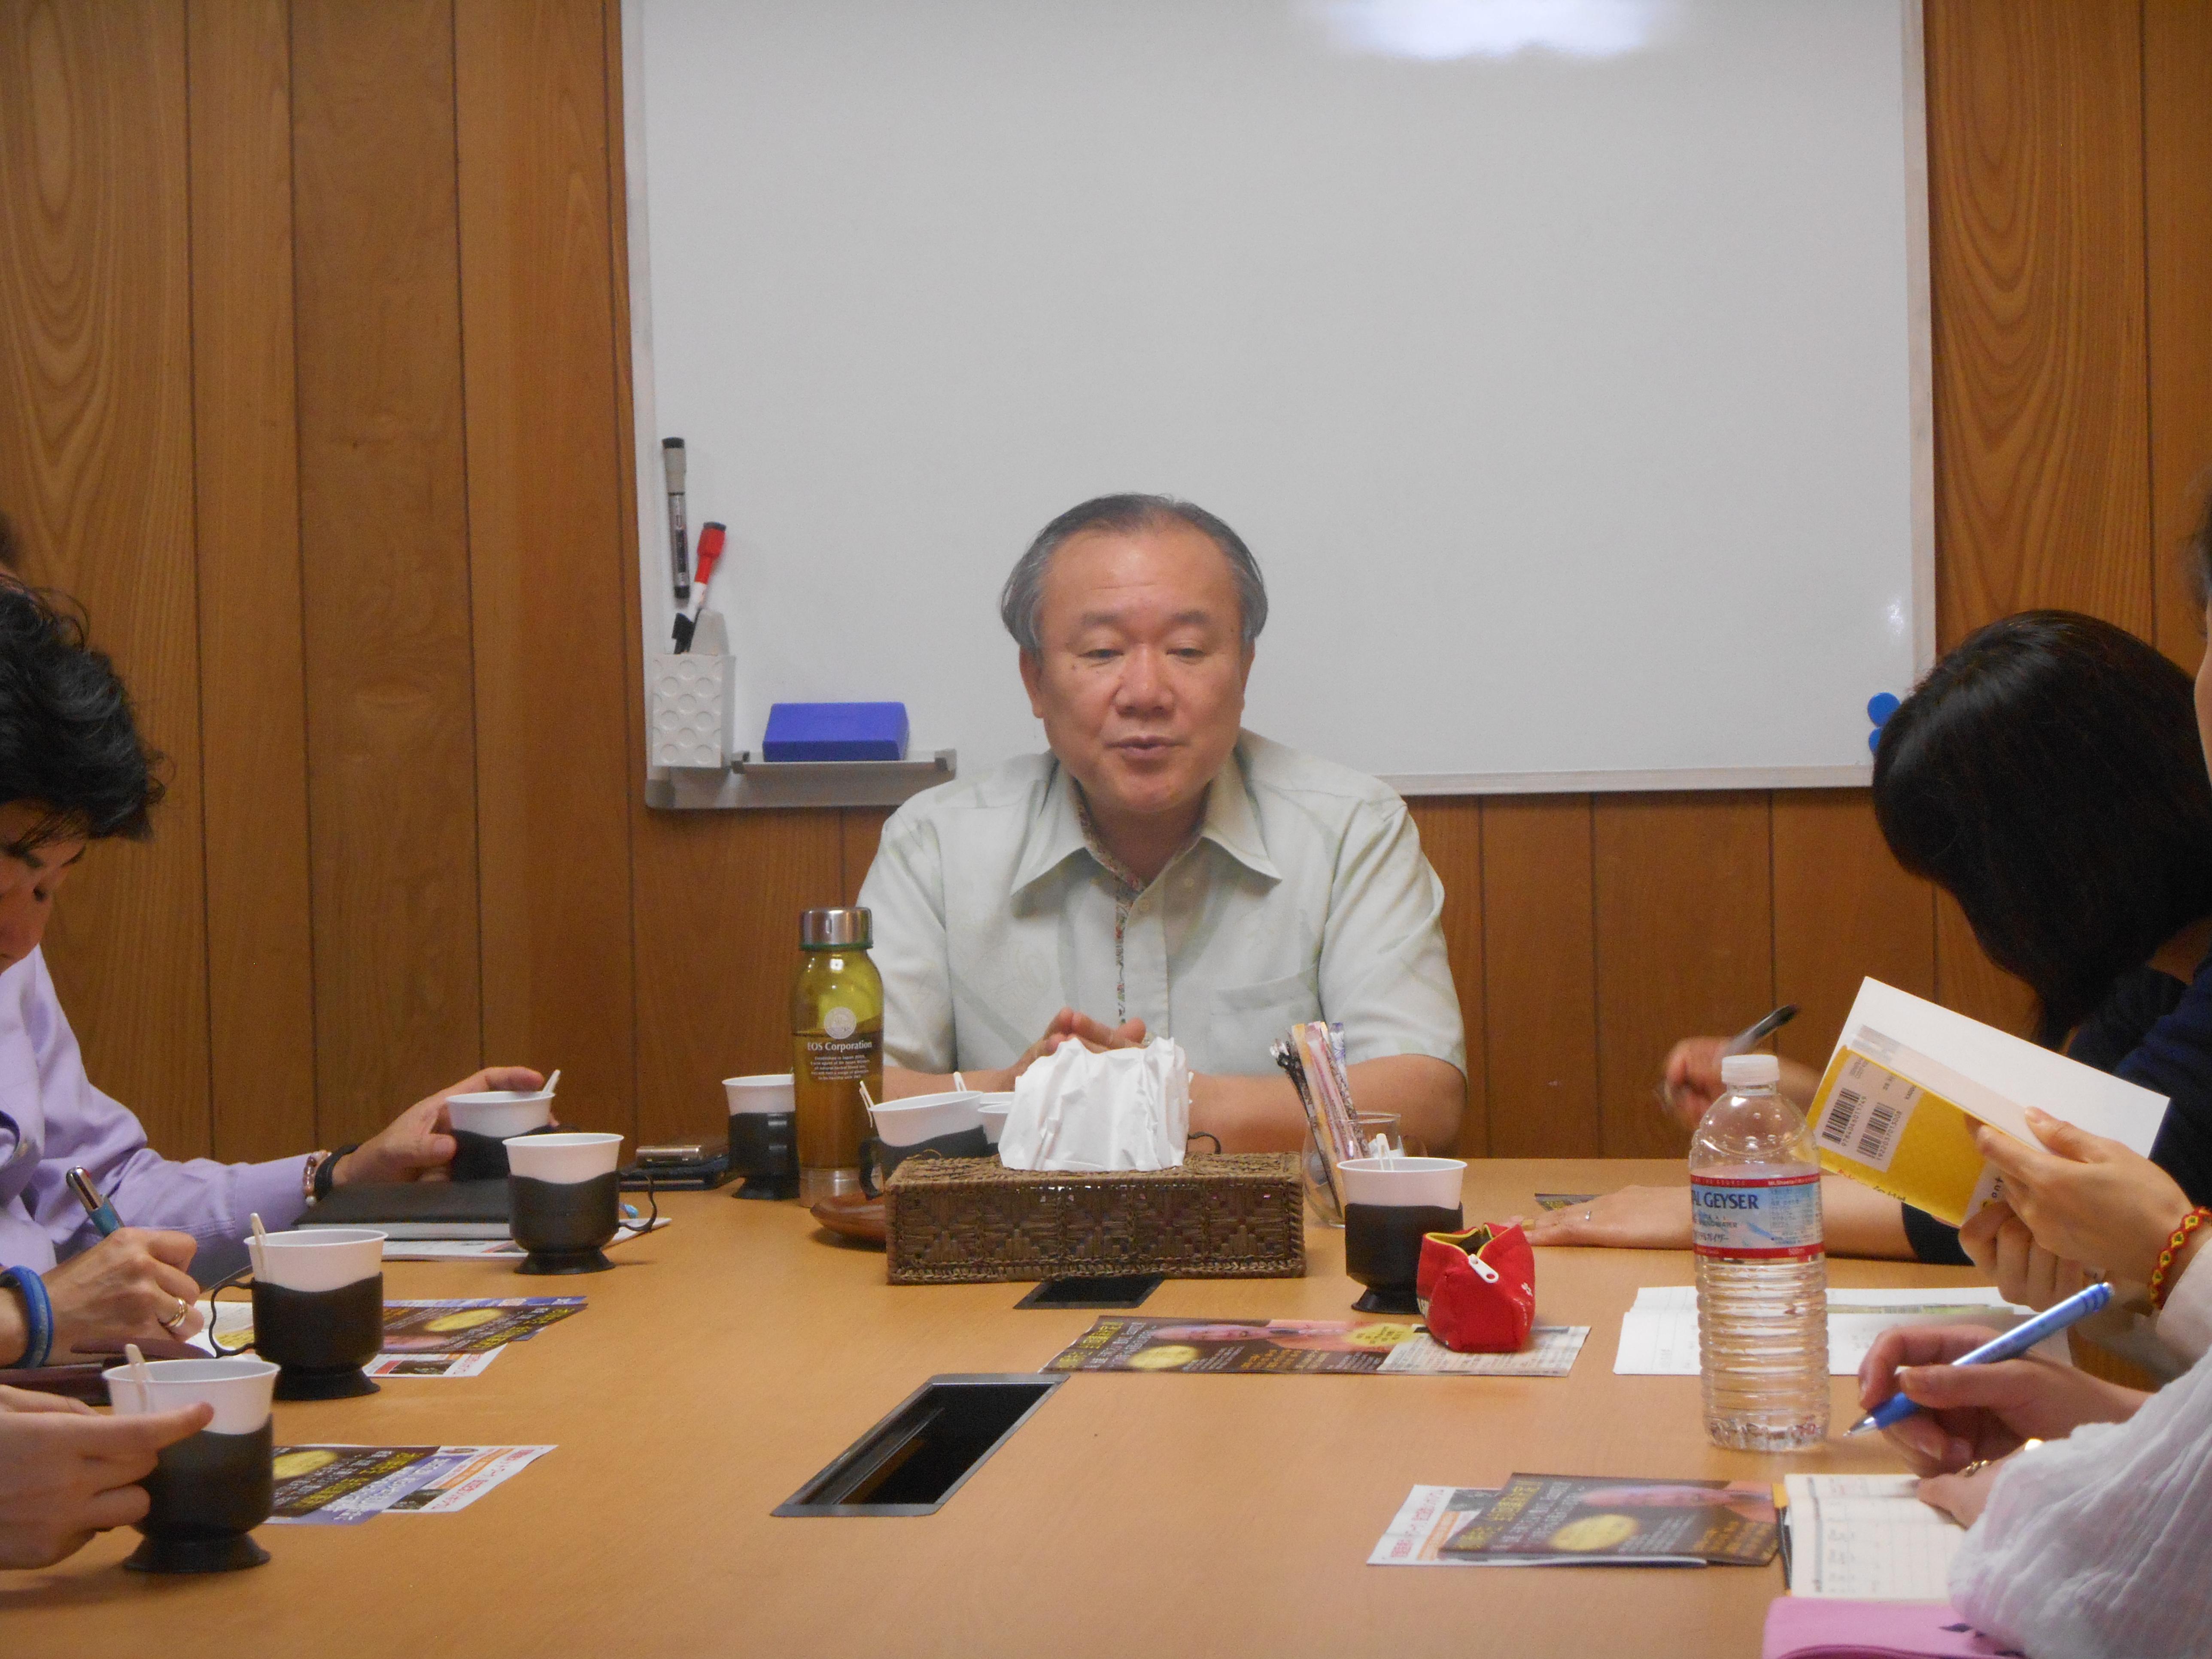 DSCN4880 - 池川先生から教えて頂いた令和の時代の生き方